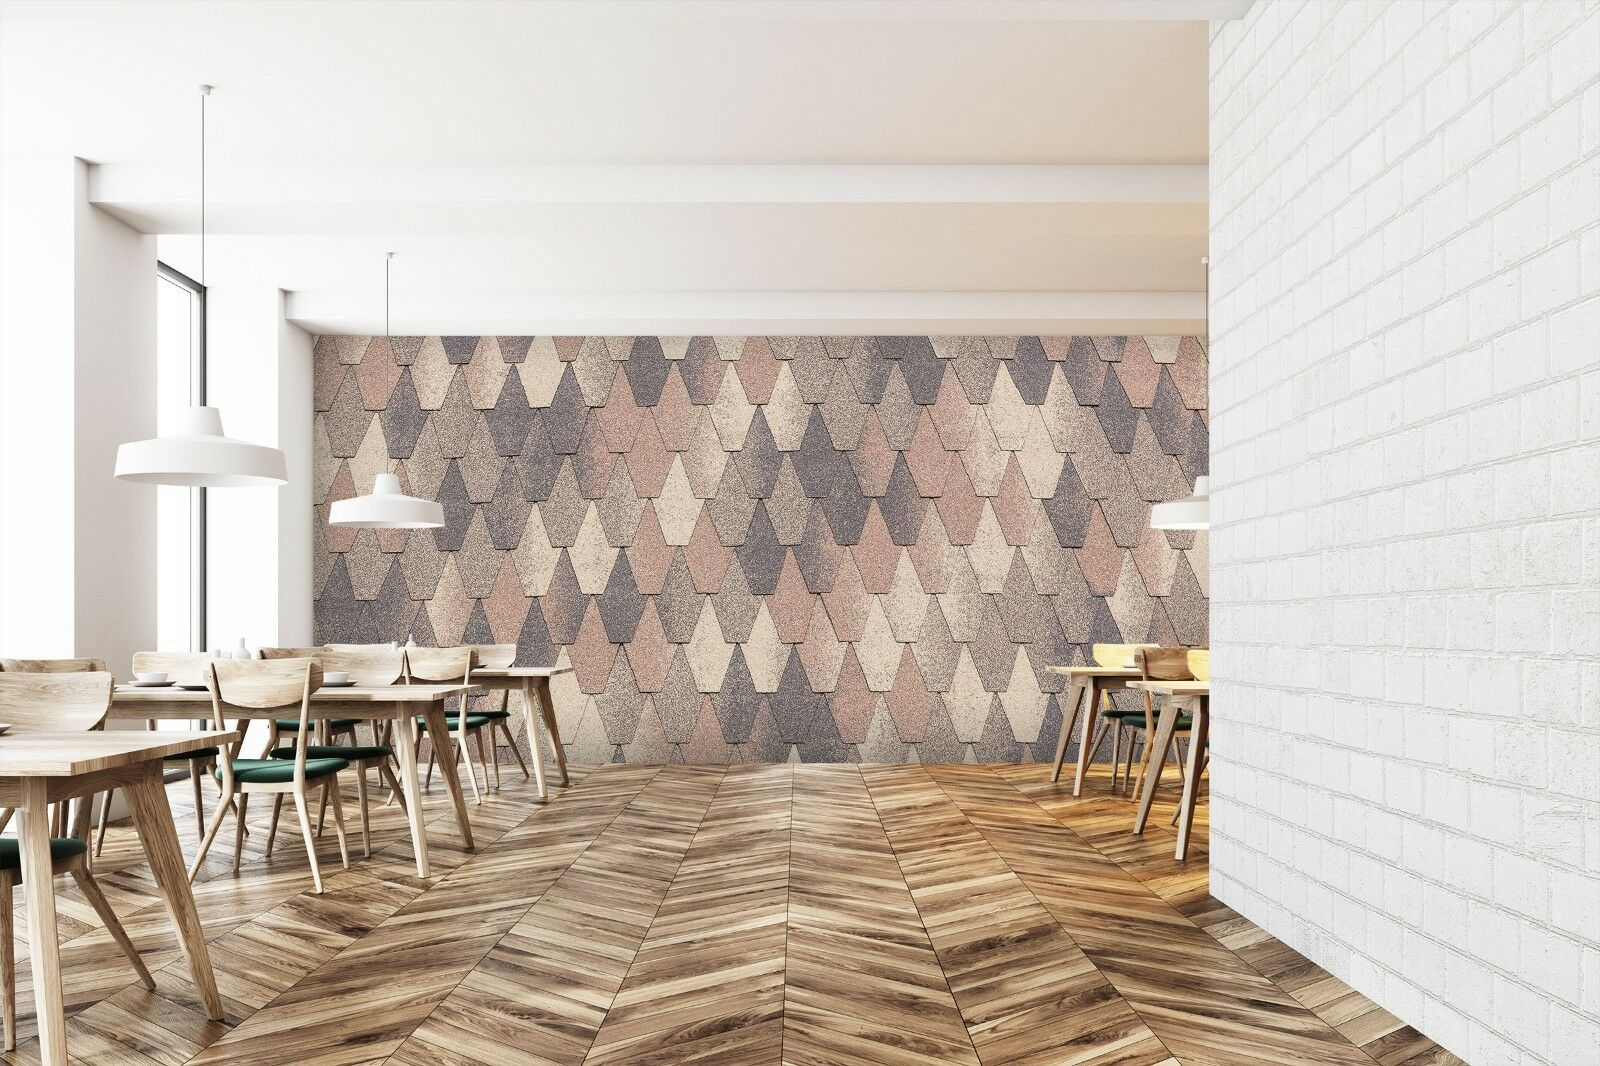 3D Fashion Tailor Art 2 Texture Tiles Marble Wall Paper Decal Wallpaper Mural AJ